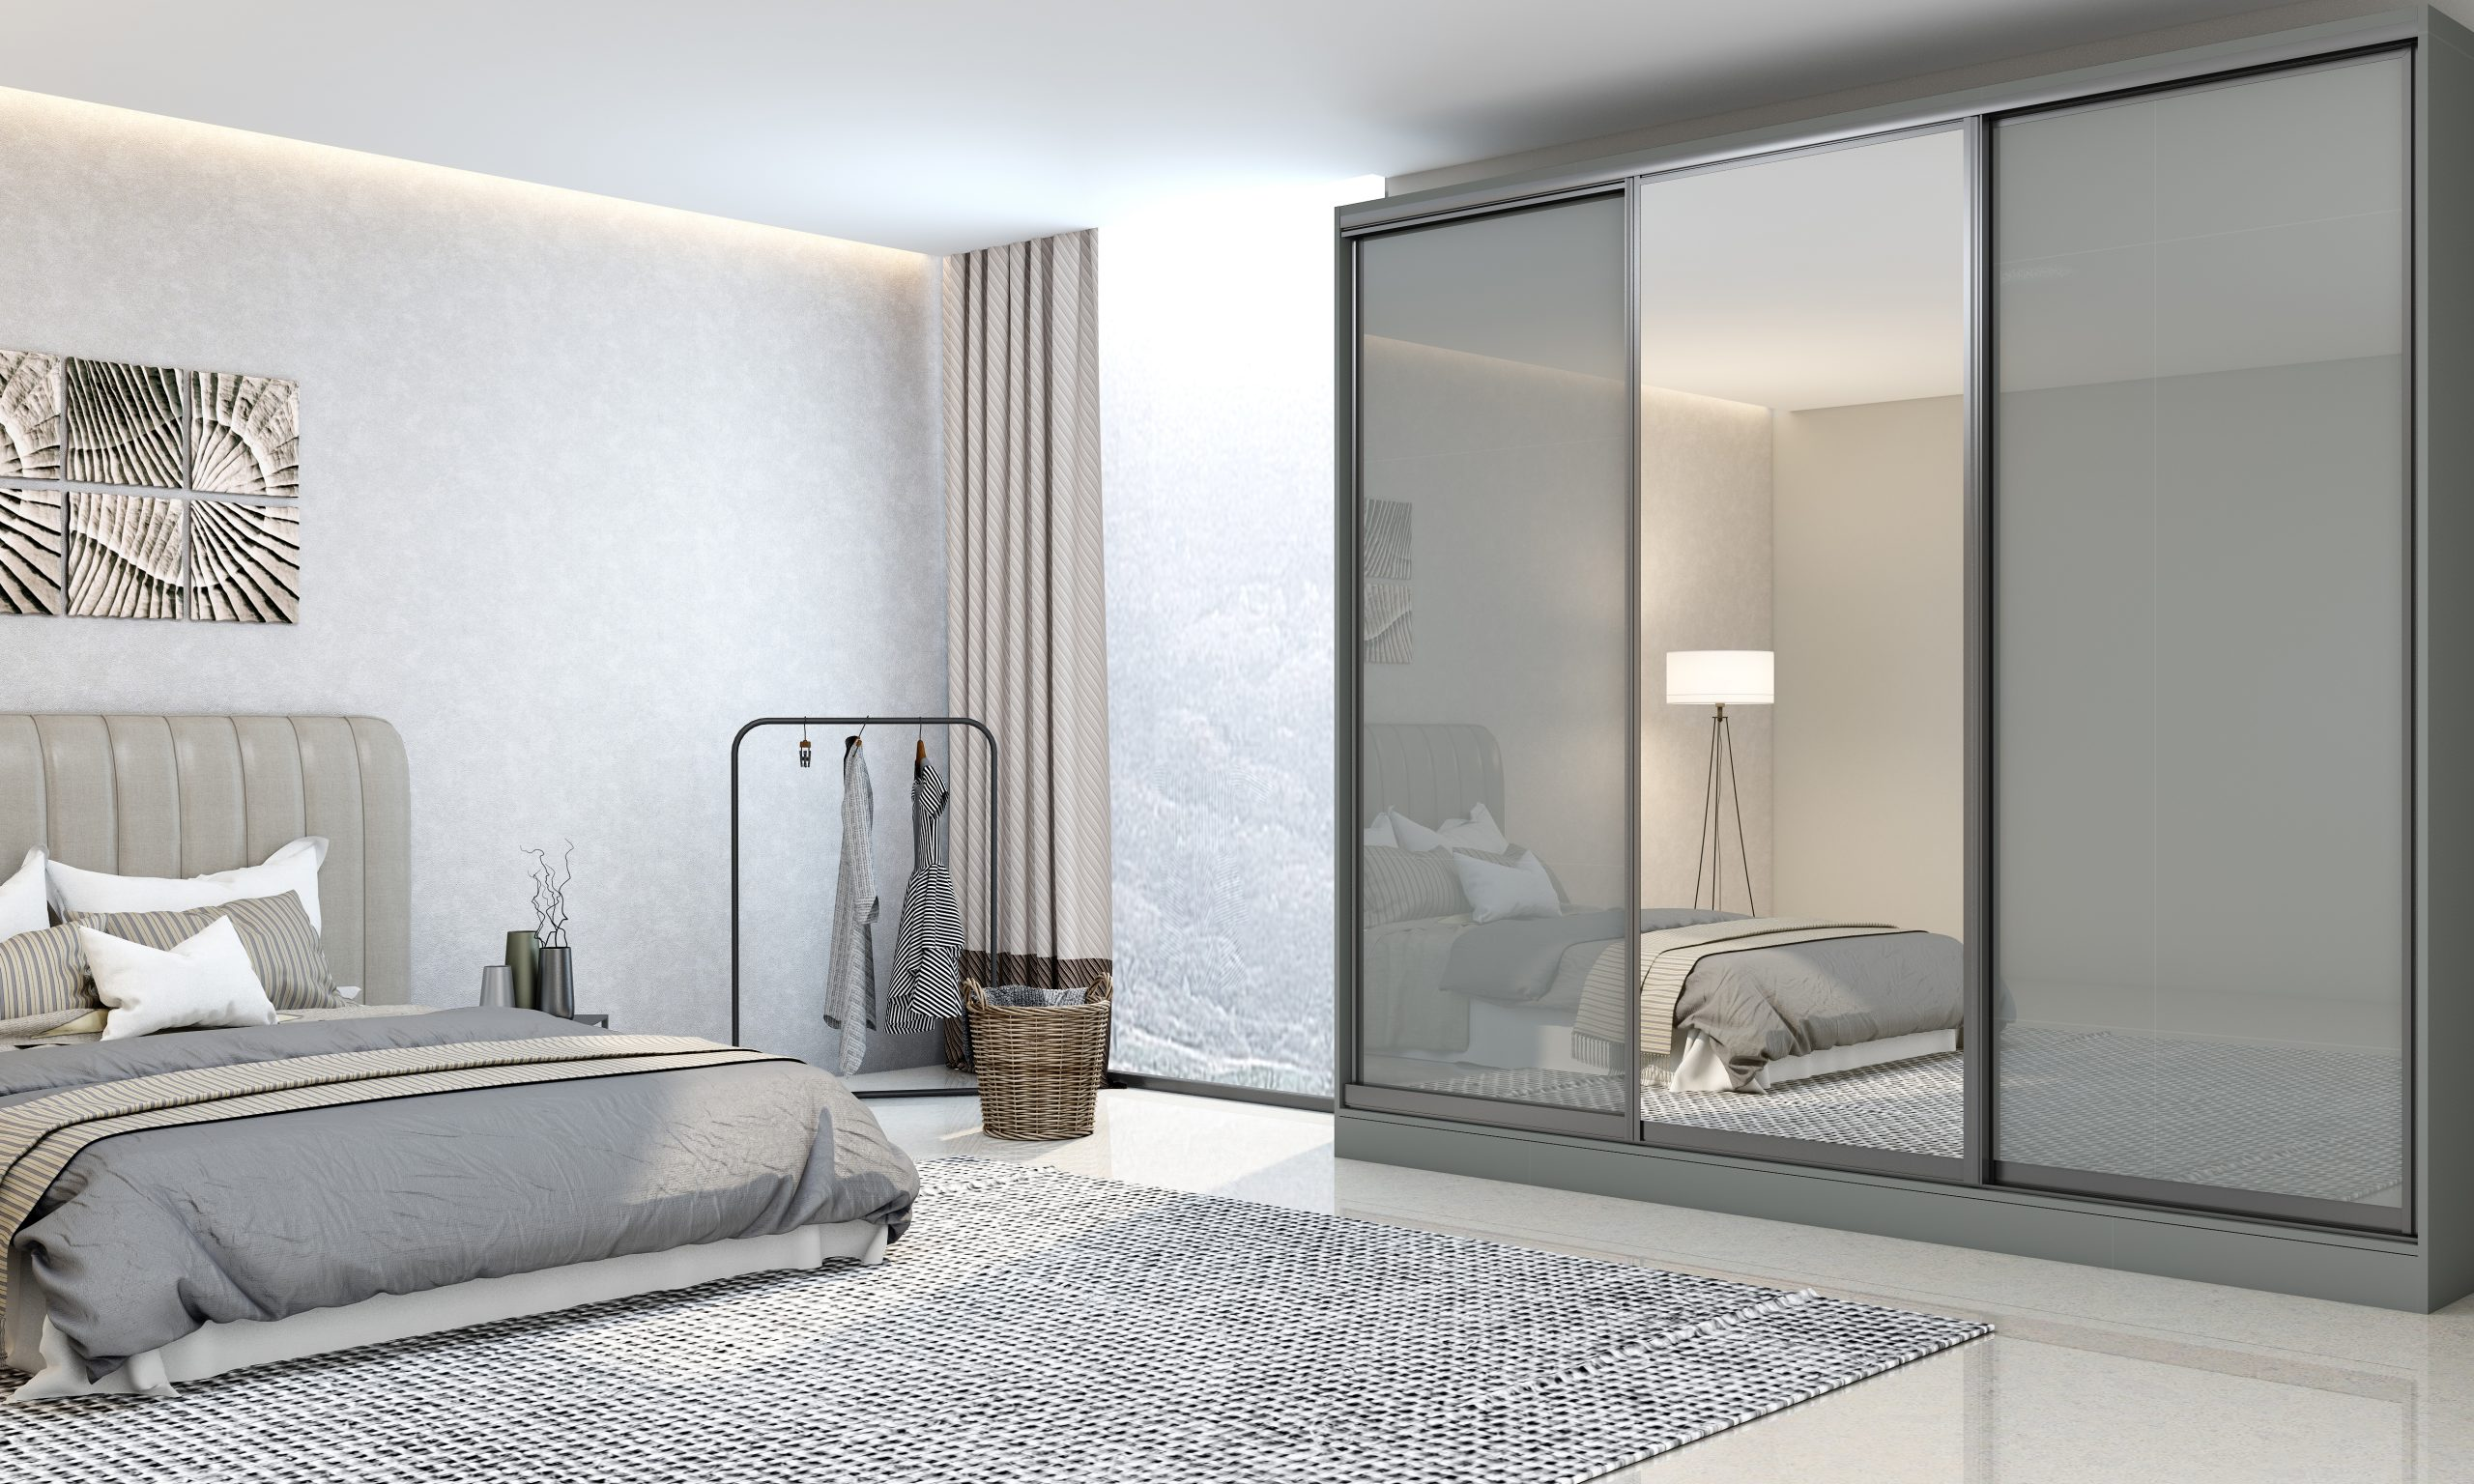 Bedroom Bespoke wooden sliding wardrobe in dust grey gloss finish with full silver Mirror